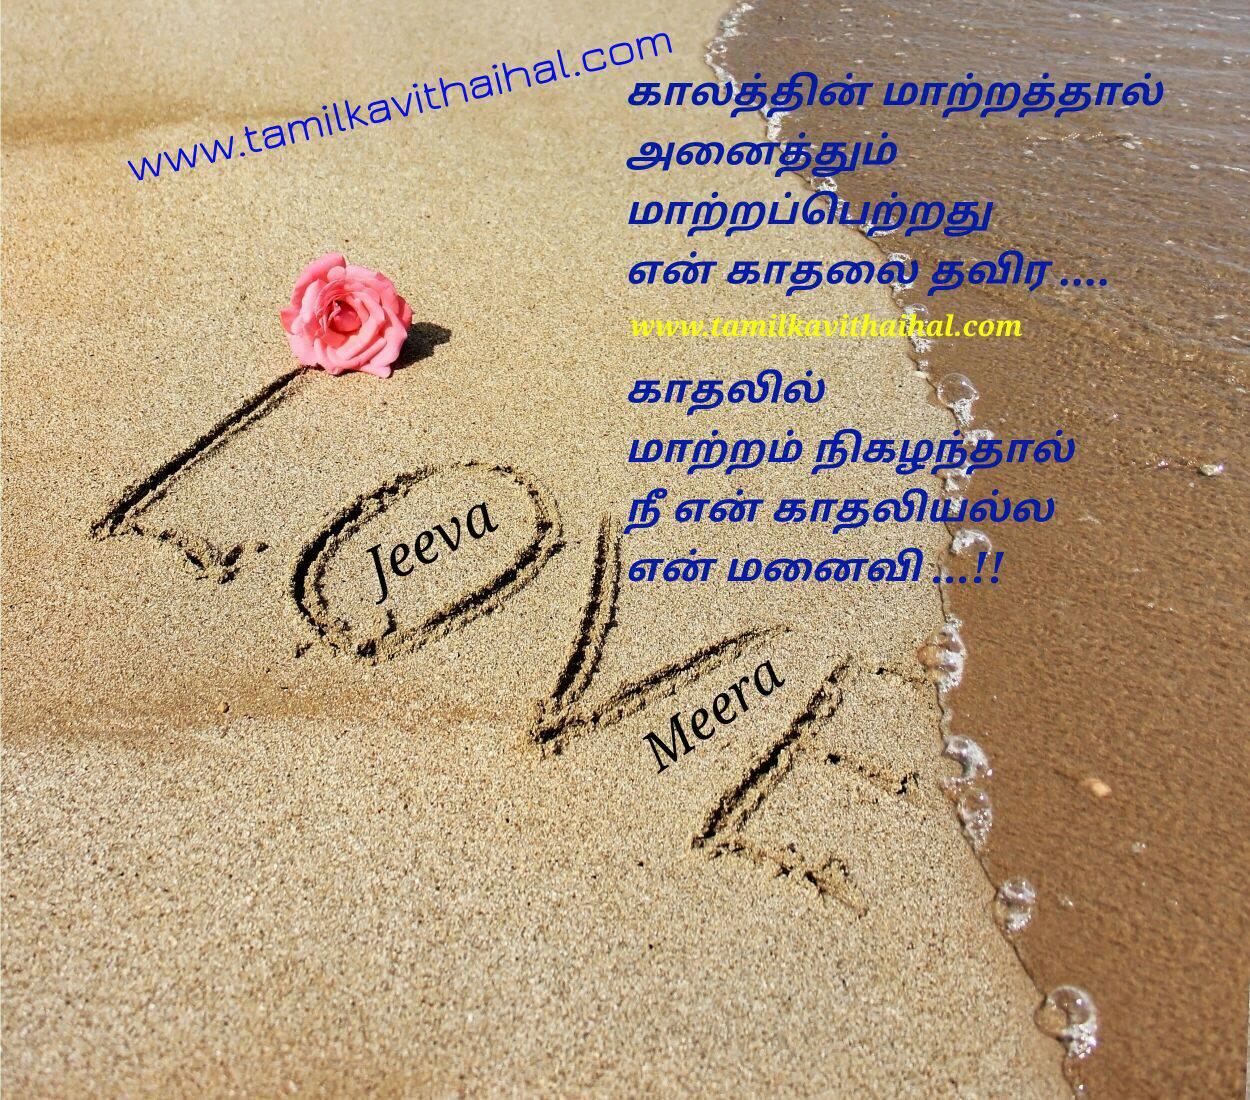 Latest Kadhal Kavithaihal Tamil Photos Maatram Kalam Life